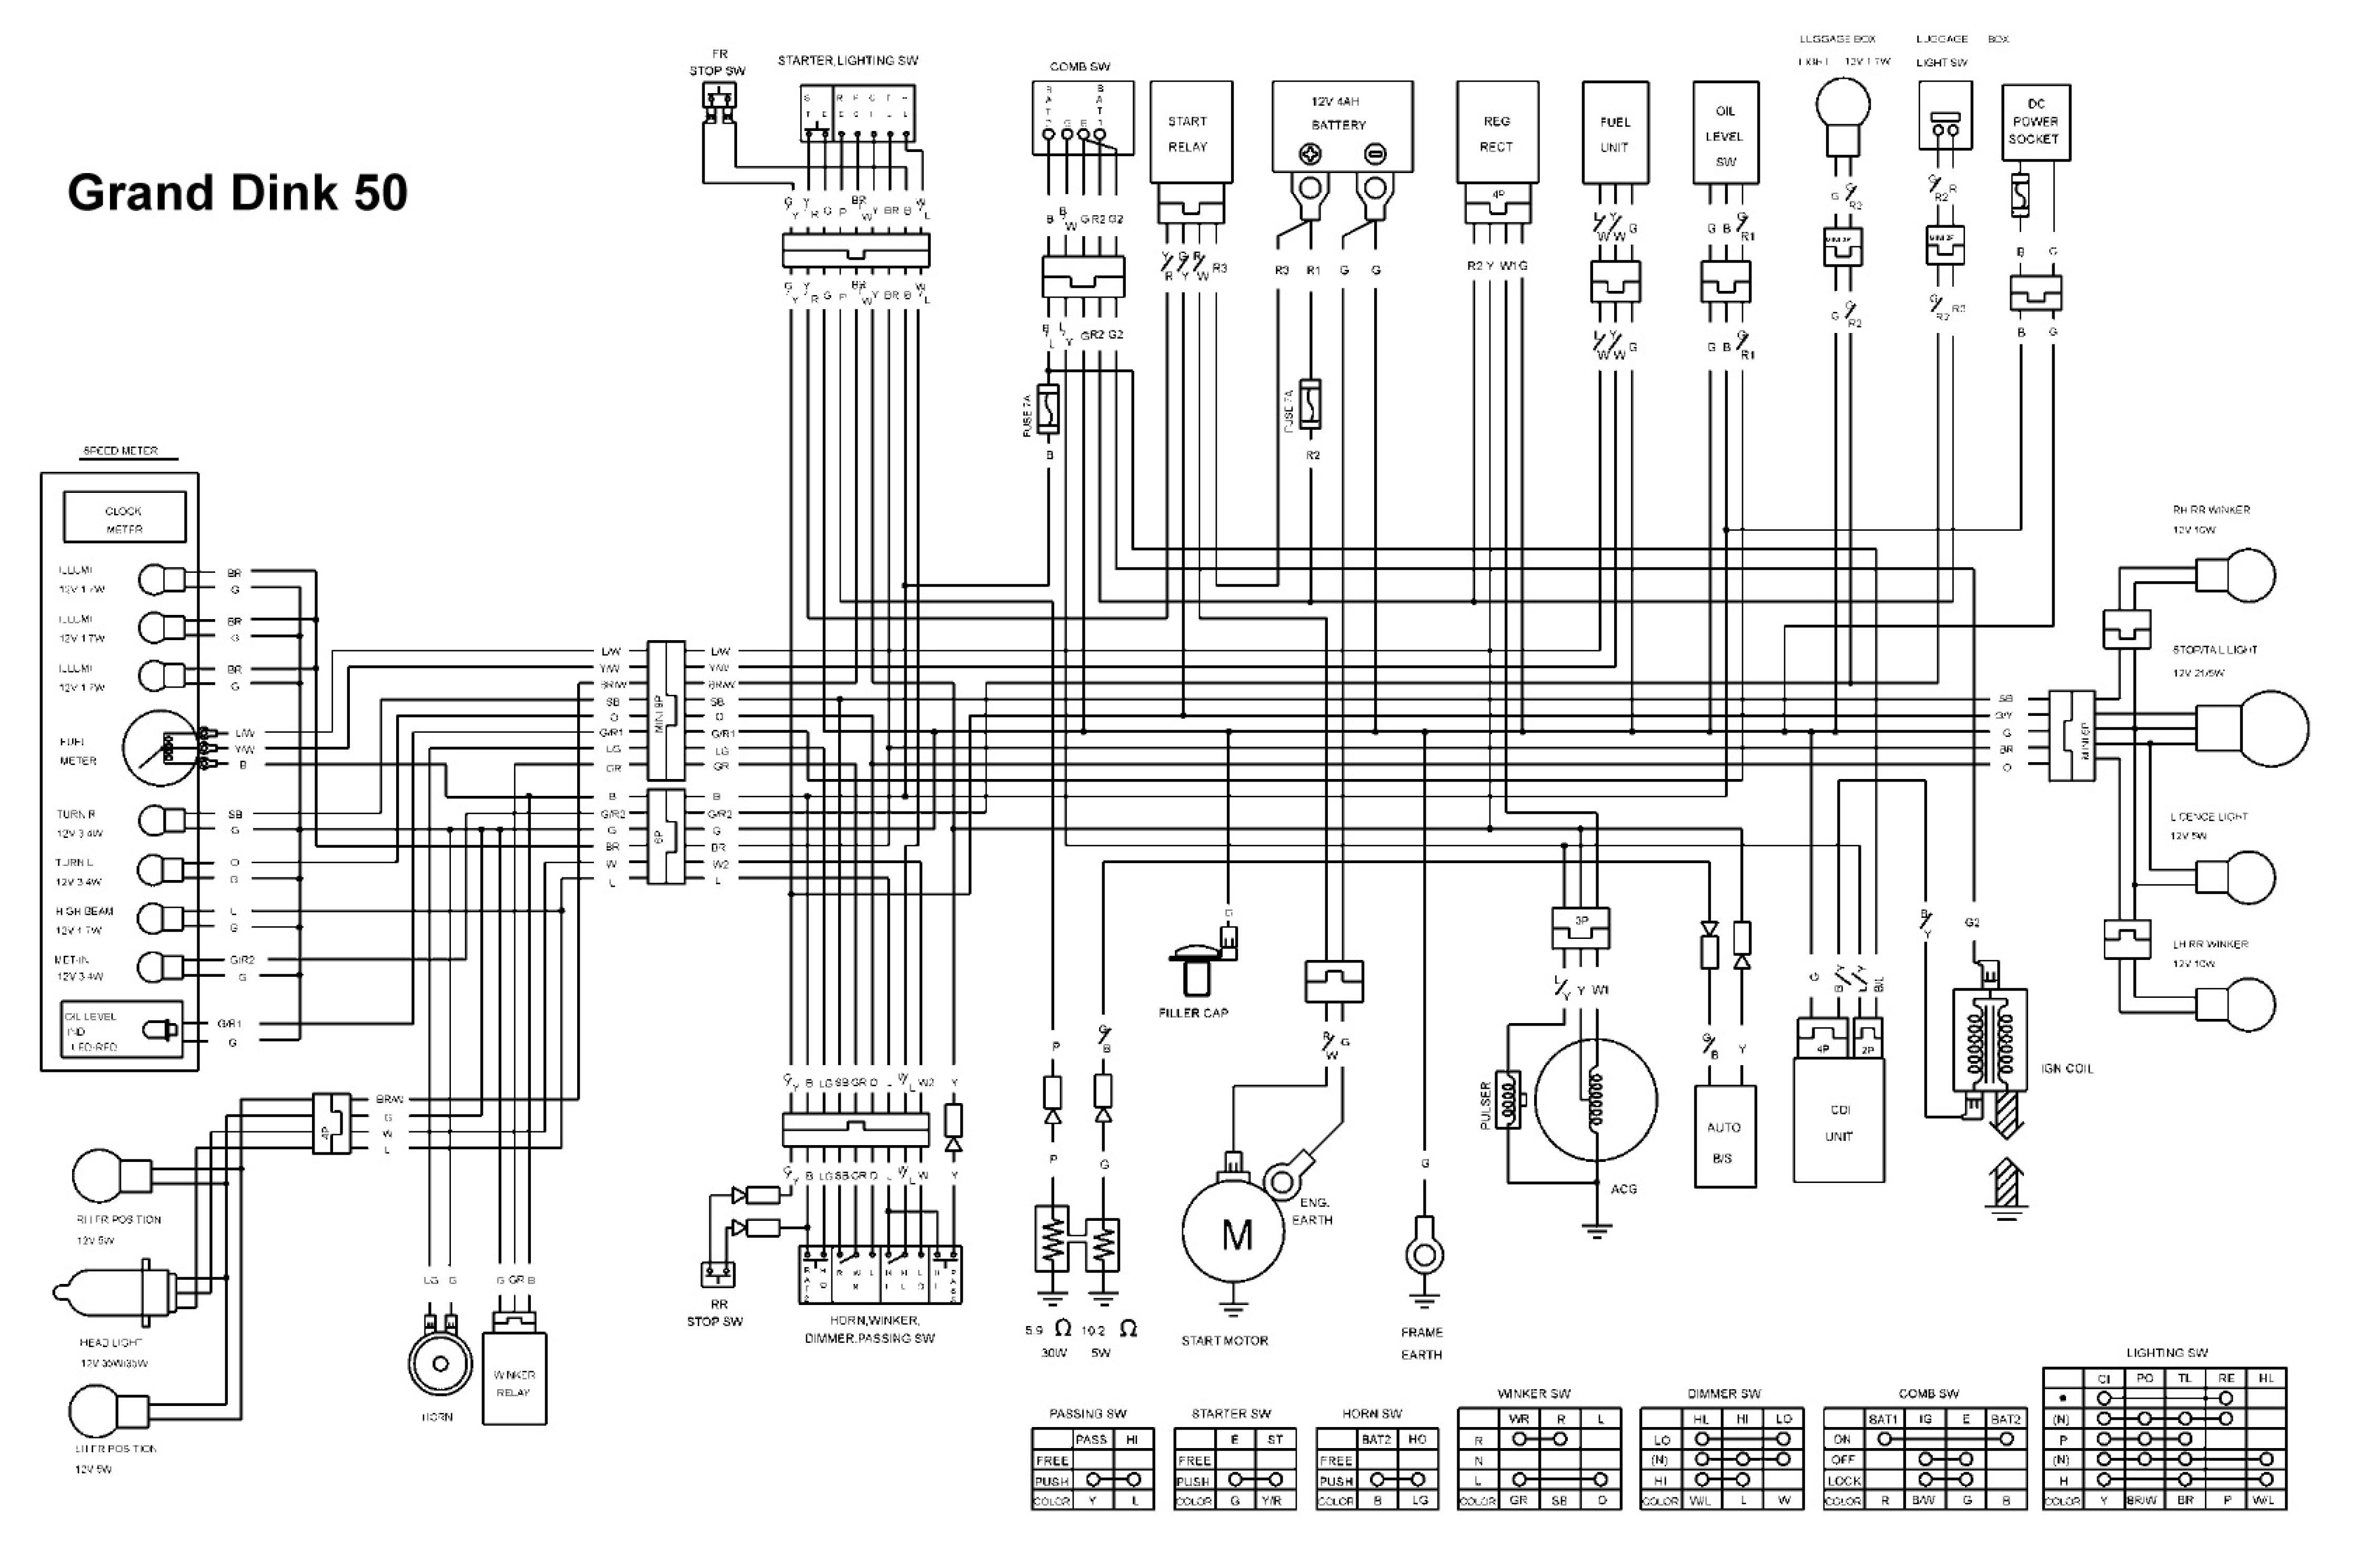 vp44 pump wiring harness diagram